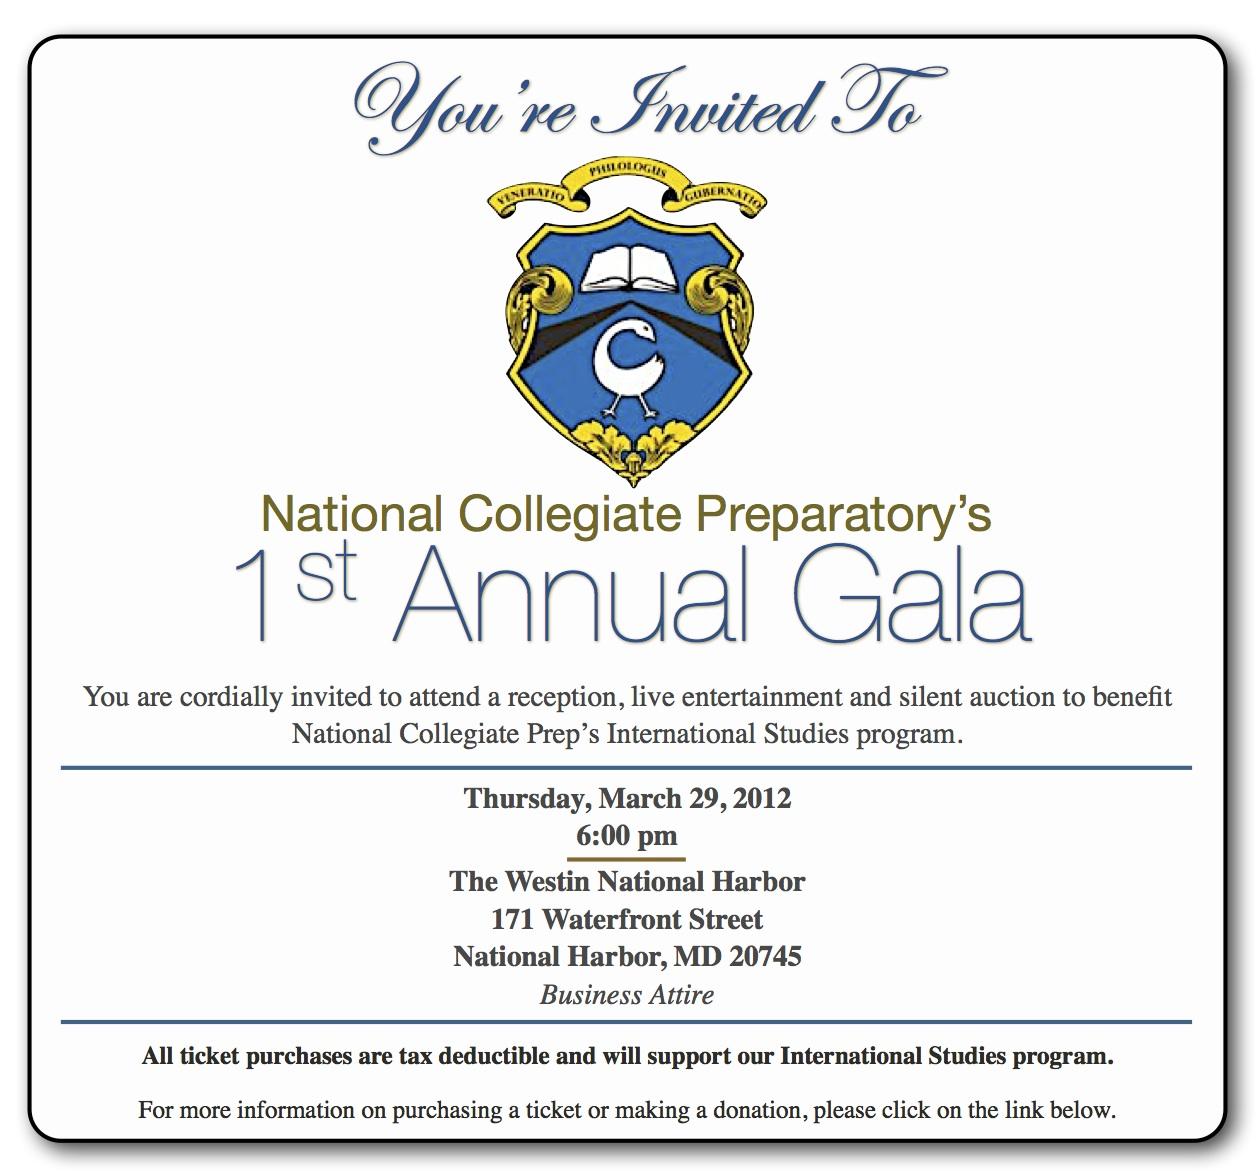 political fundraising invitations